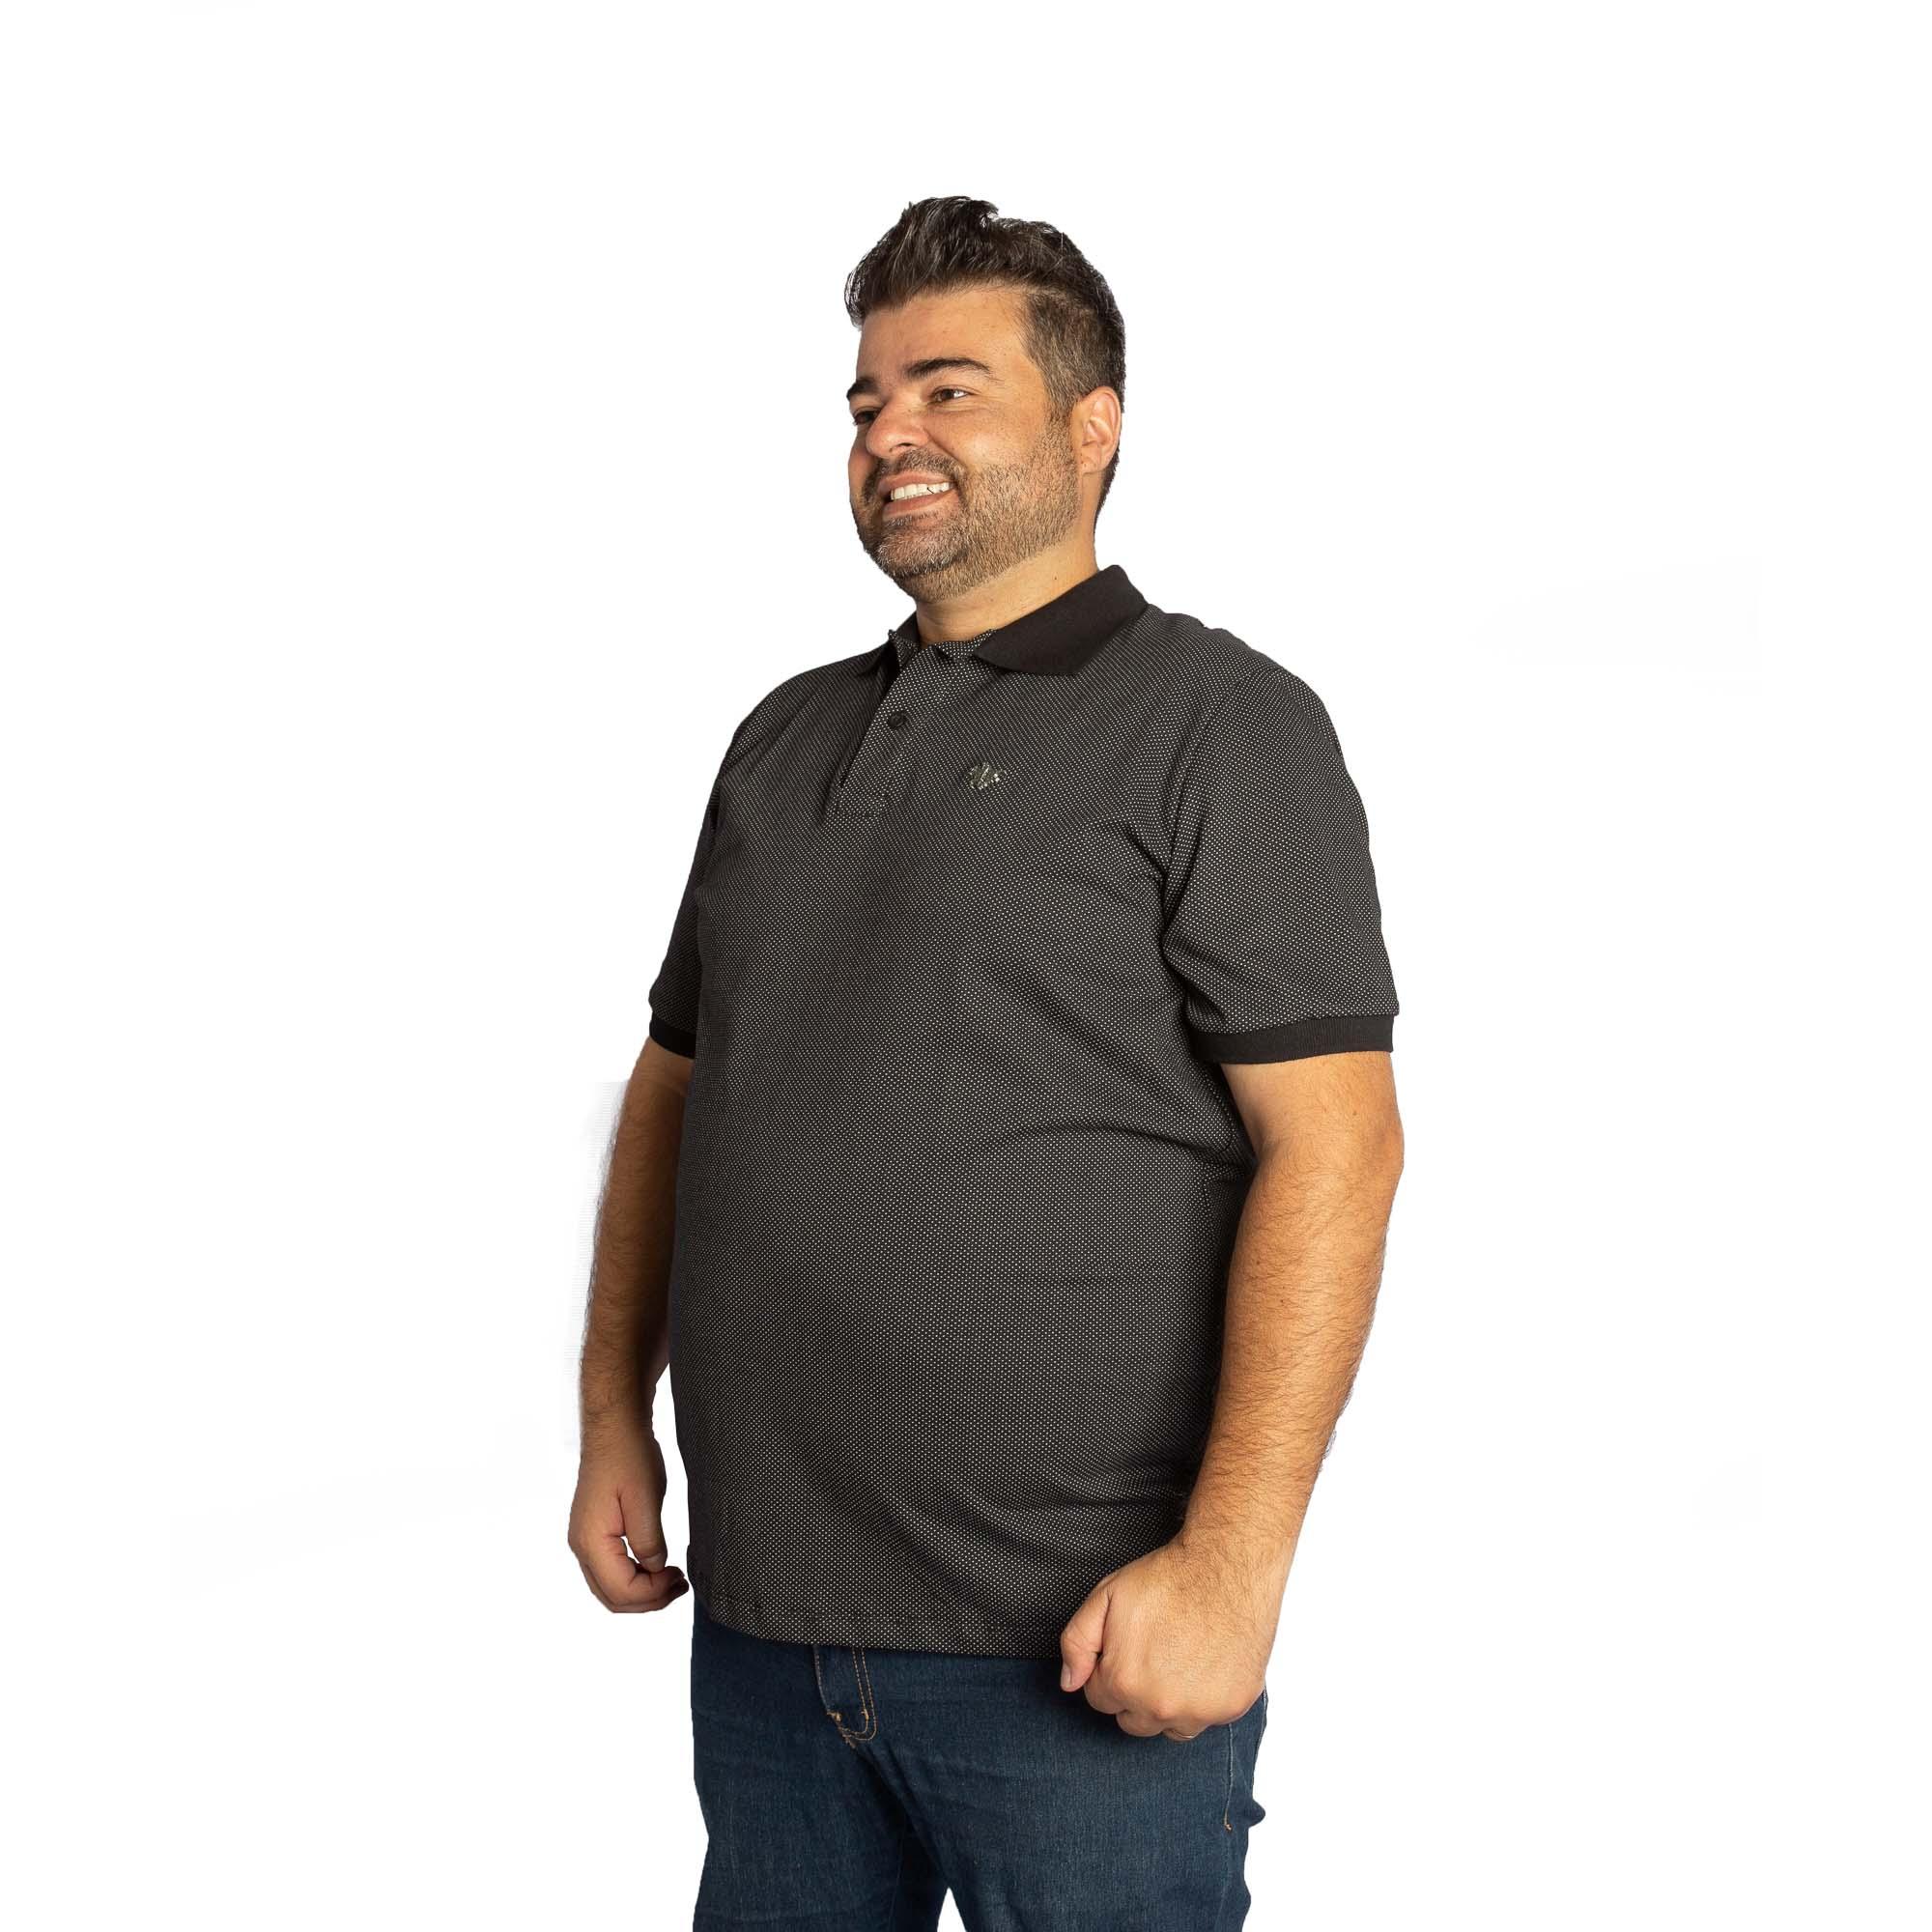 Camiseta Polo Masculina Preto - Polo